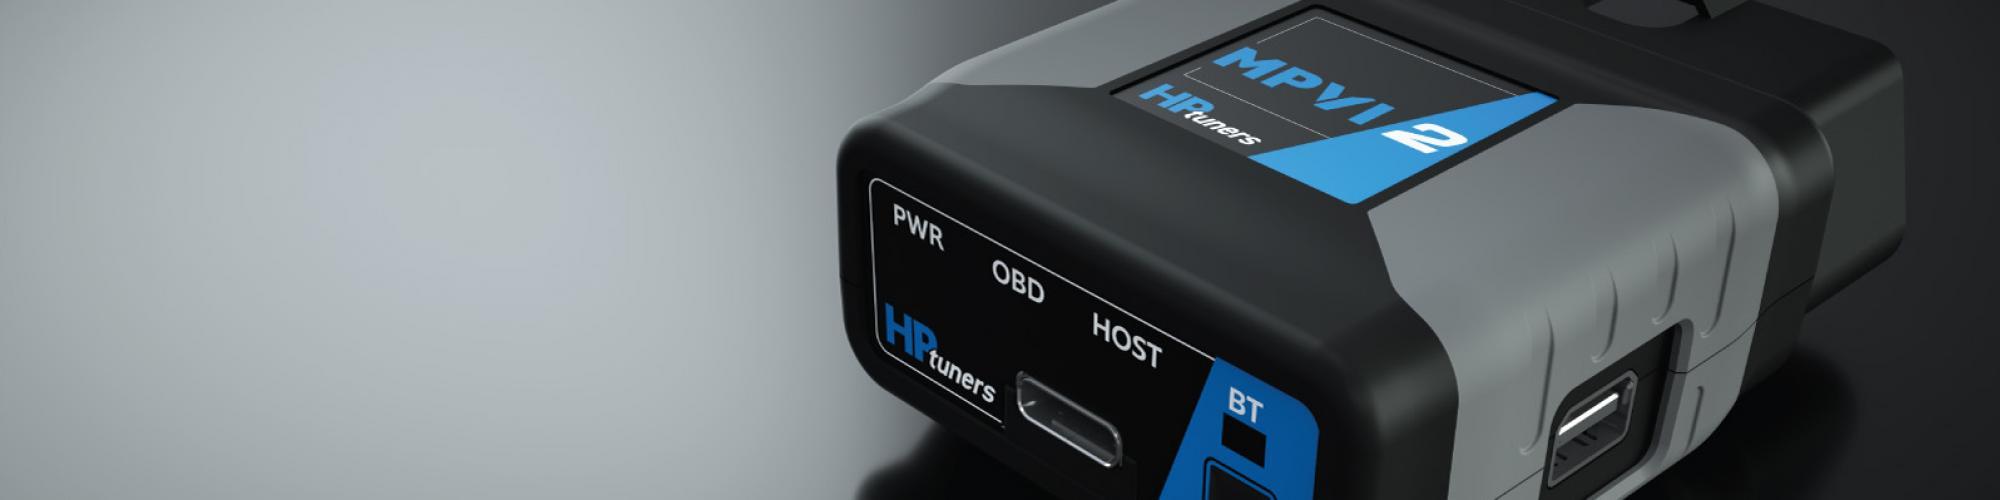 HP Tuners Europe